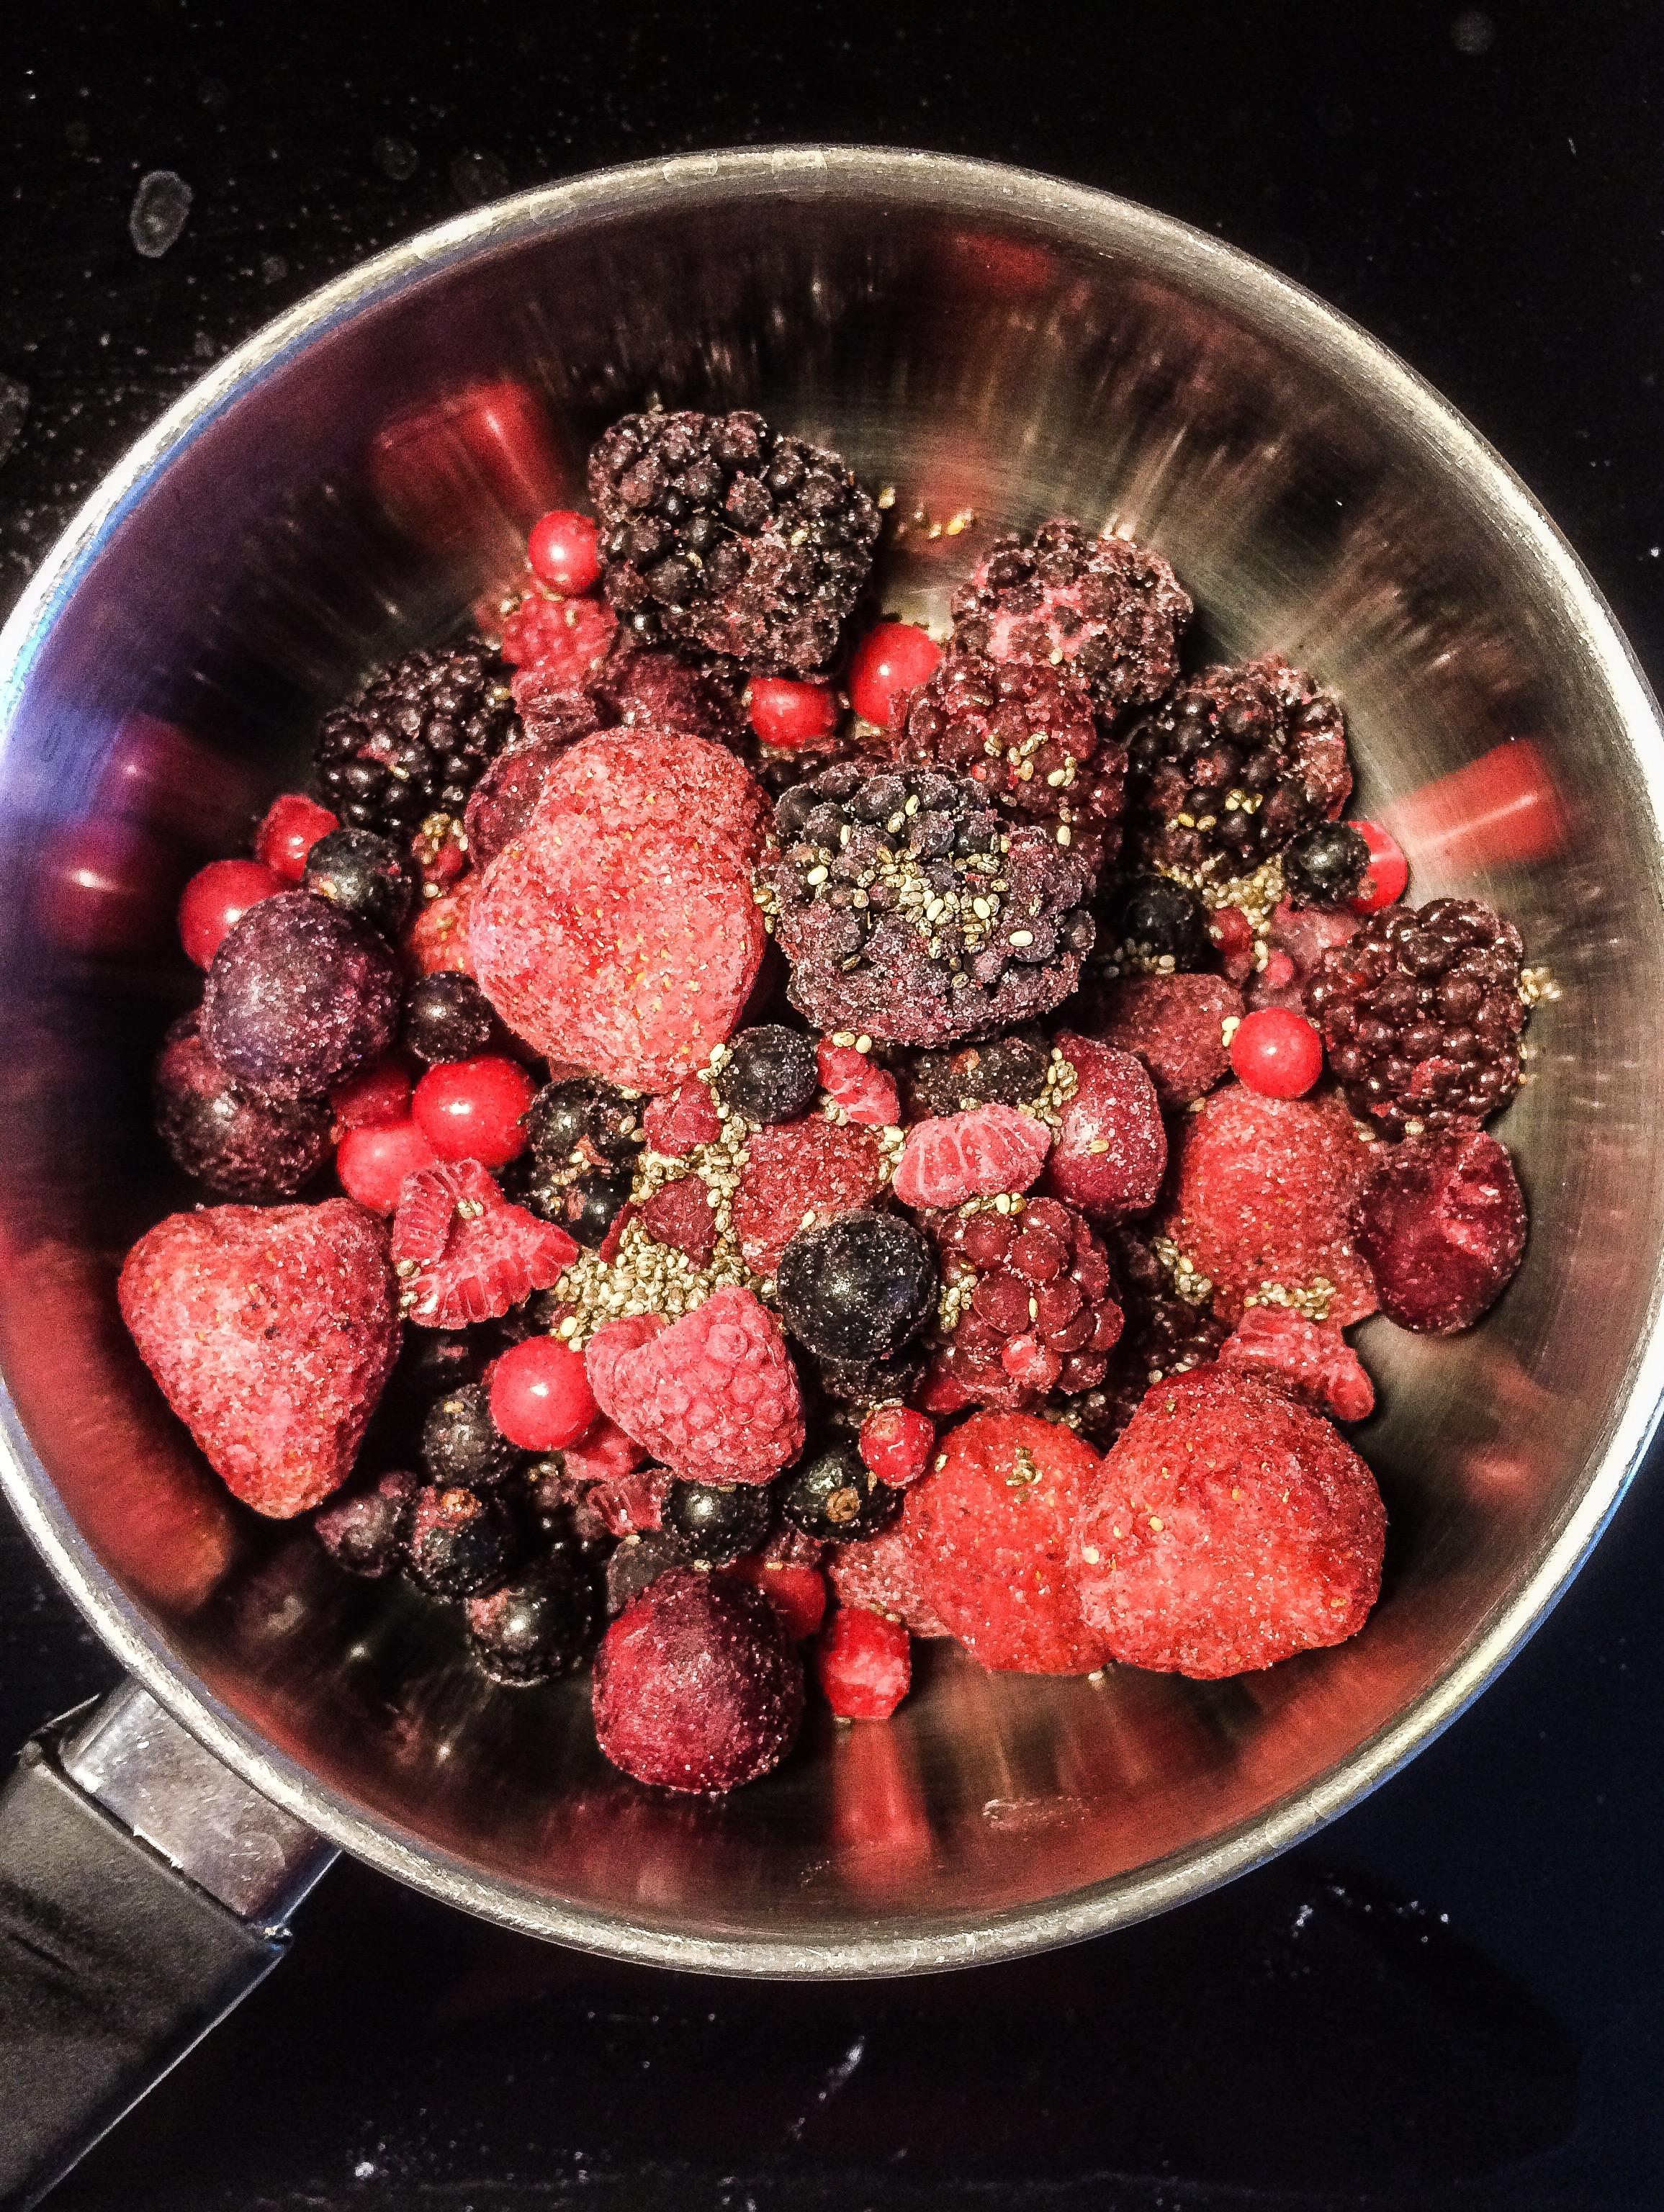 frozen_berries_and_chia_seeds_jam